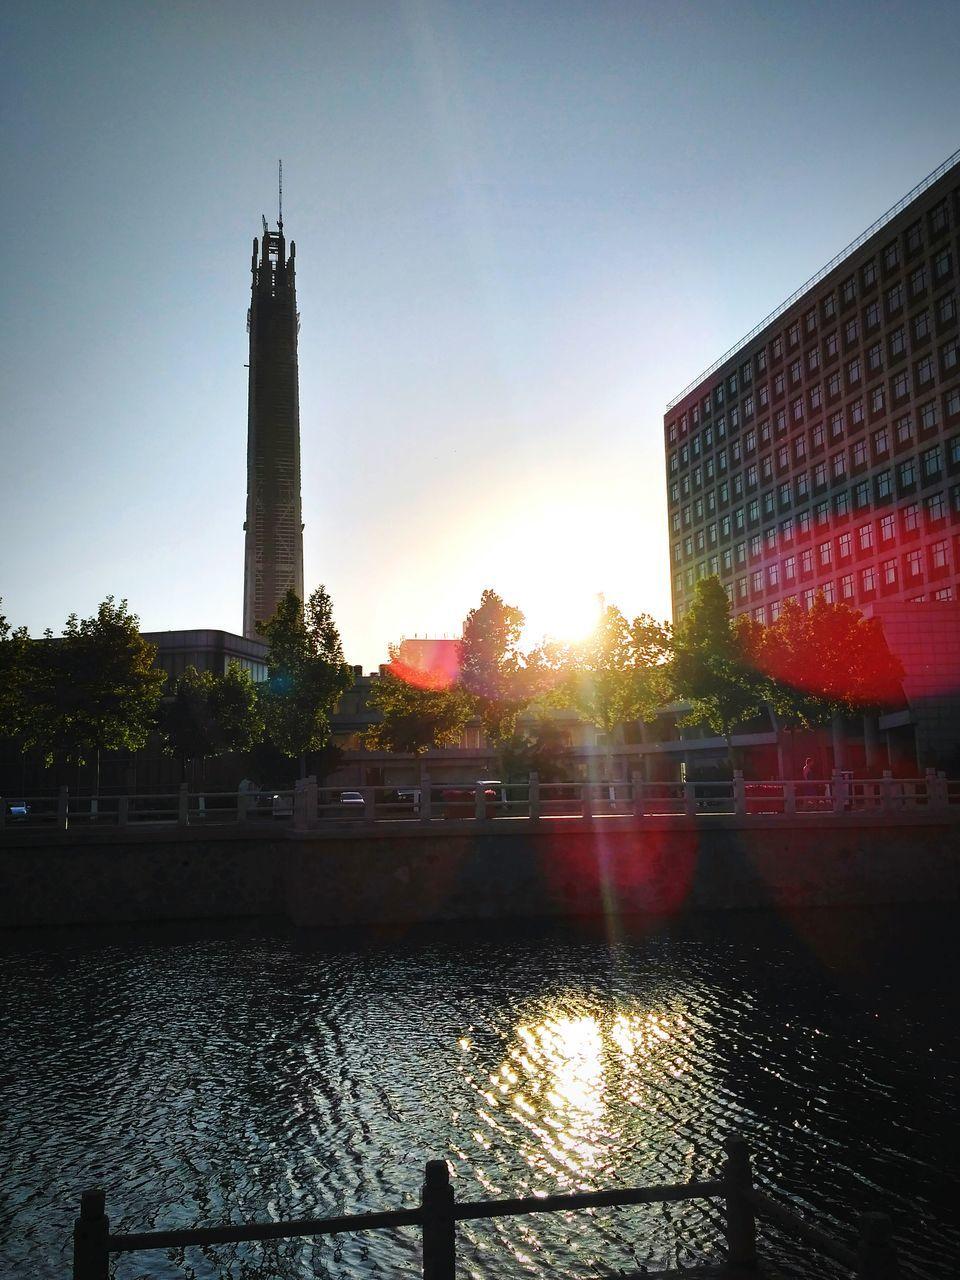 City Buildings During Sunrise